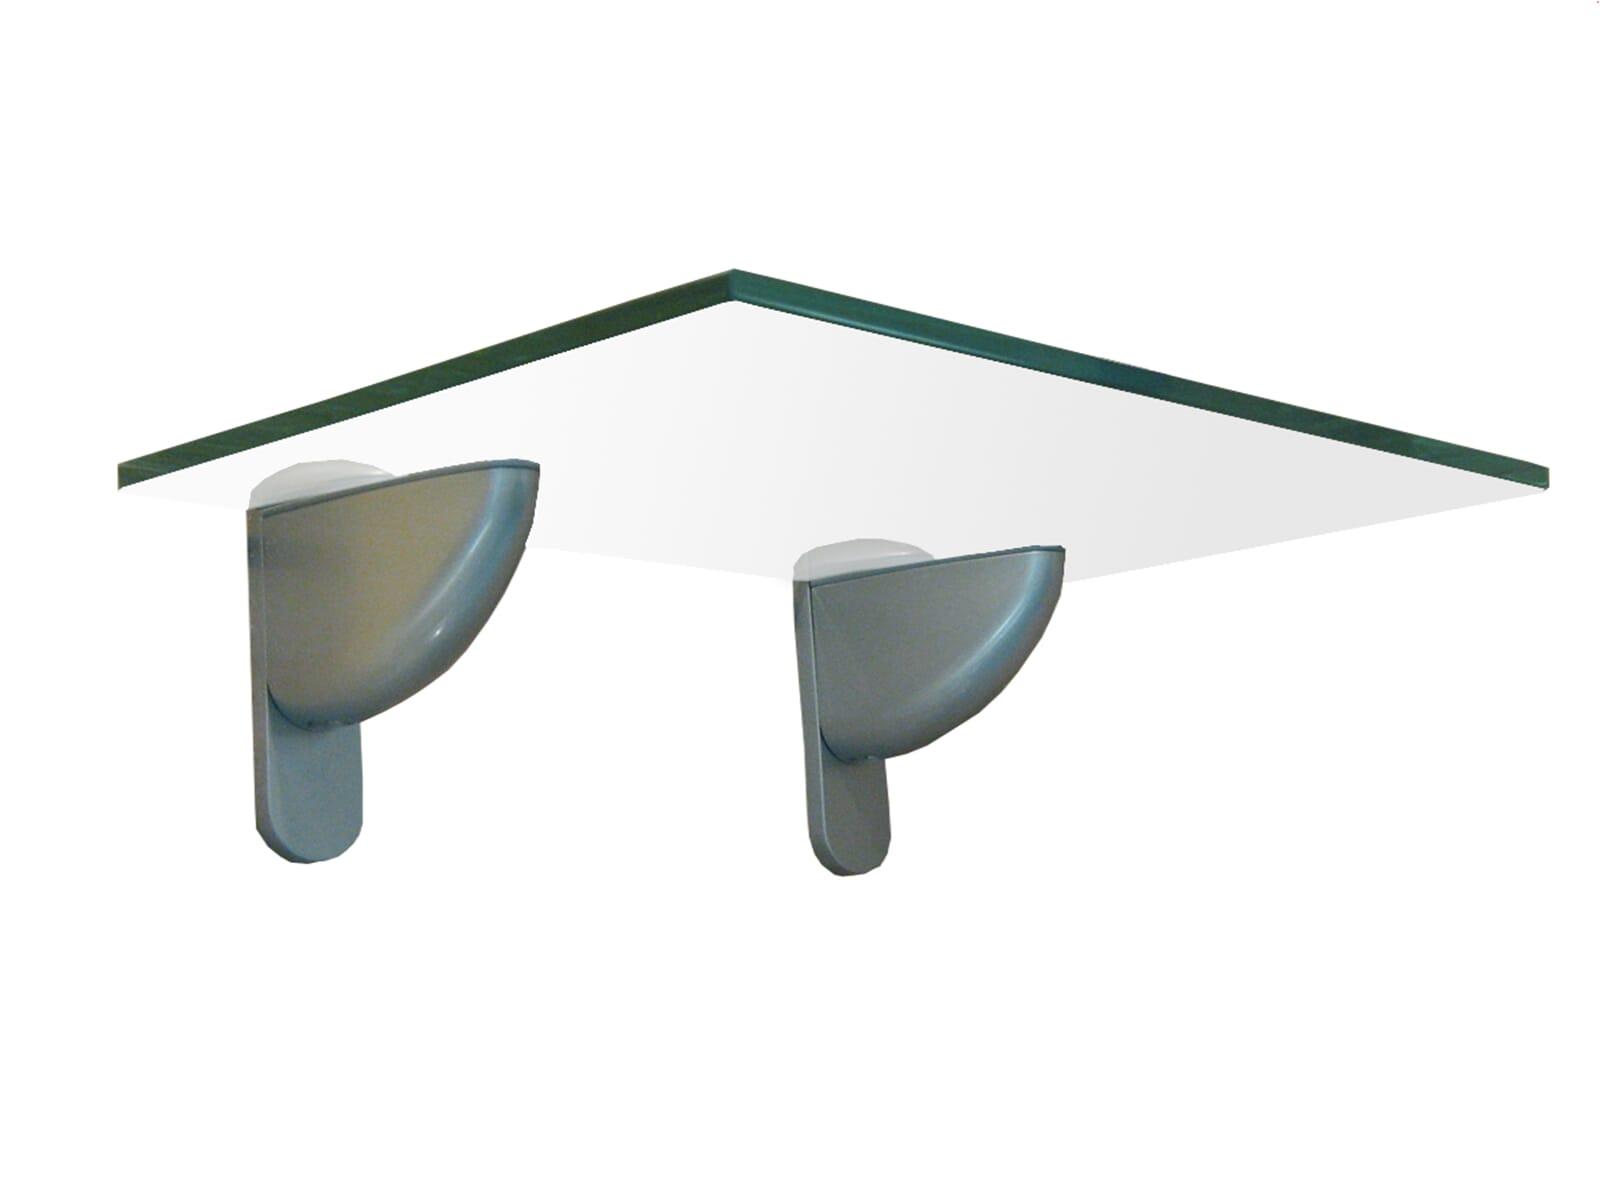 Sagemüller & Rohrer 47513 Glasbodenset mit Klemmträgern